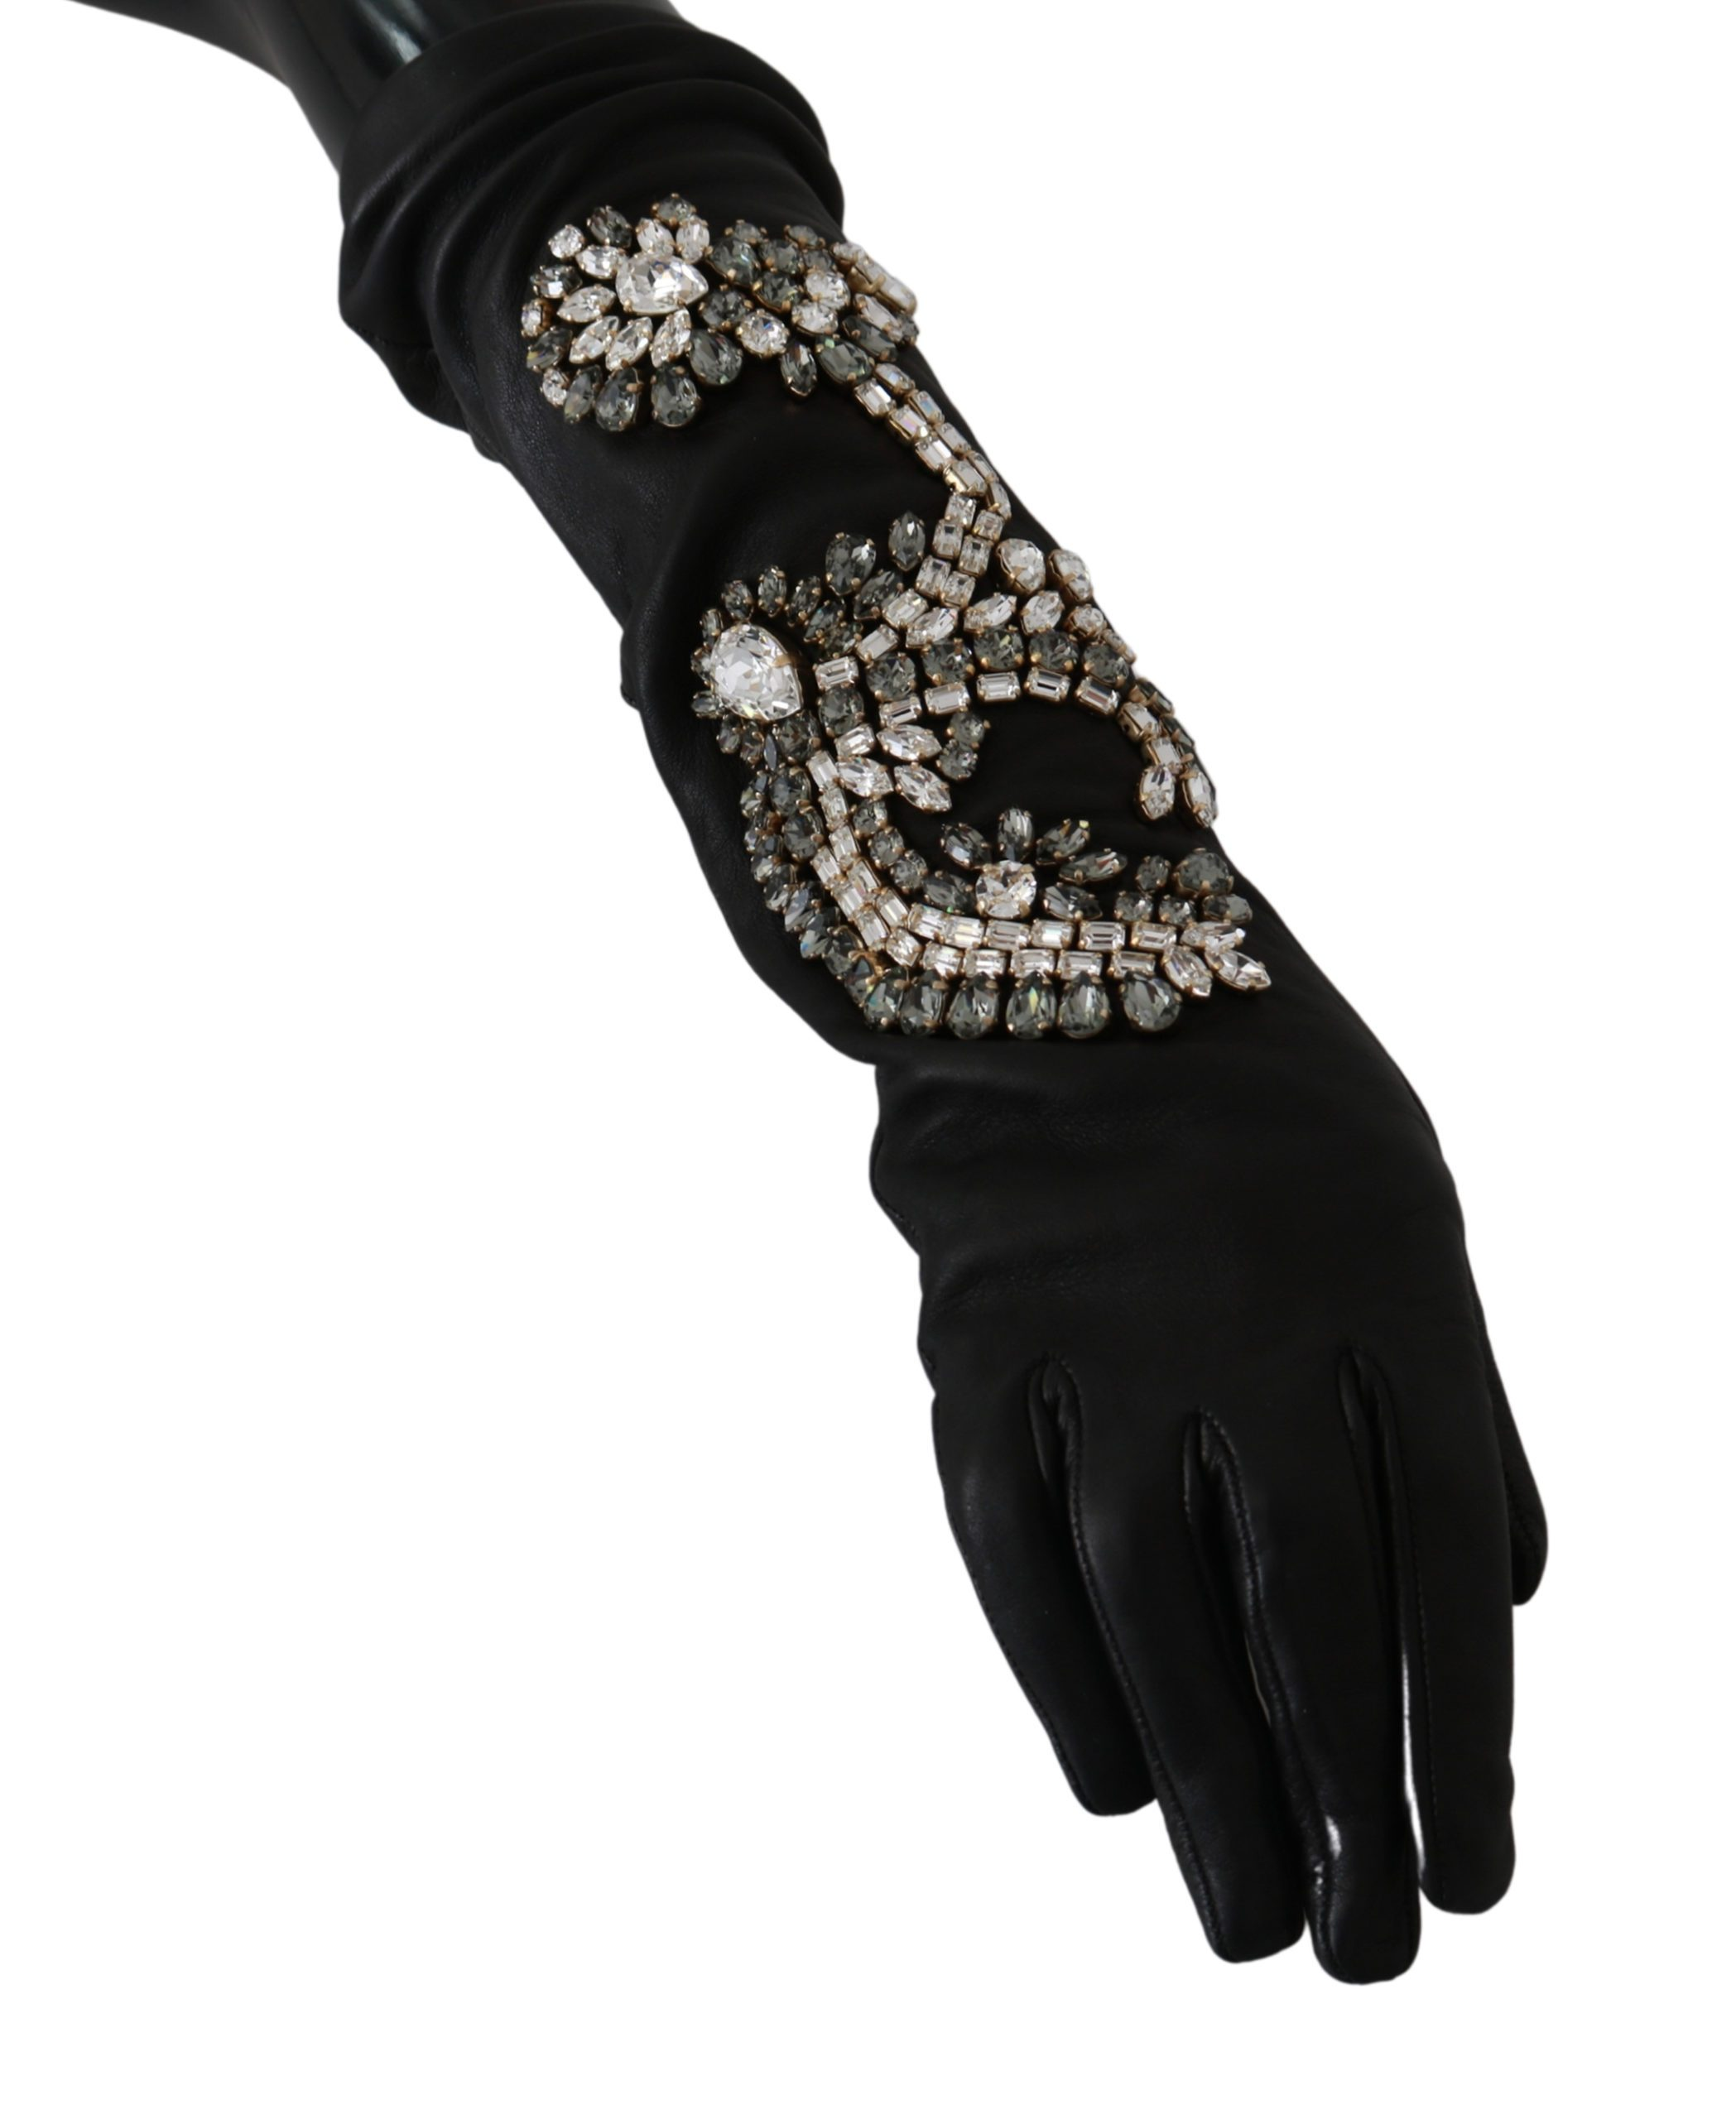 Dolce & Gabbana Women's Leather Lamb Skin Crystal Gloves Black LB1031 - 6.5 XS